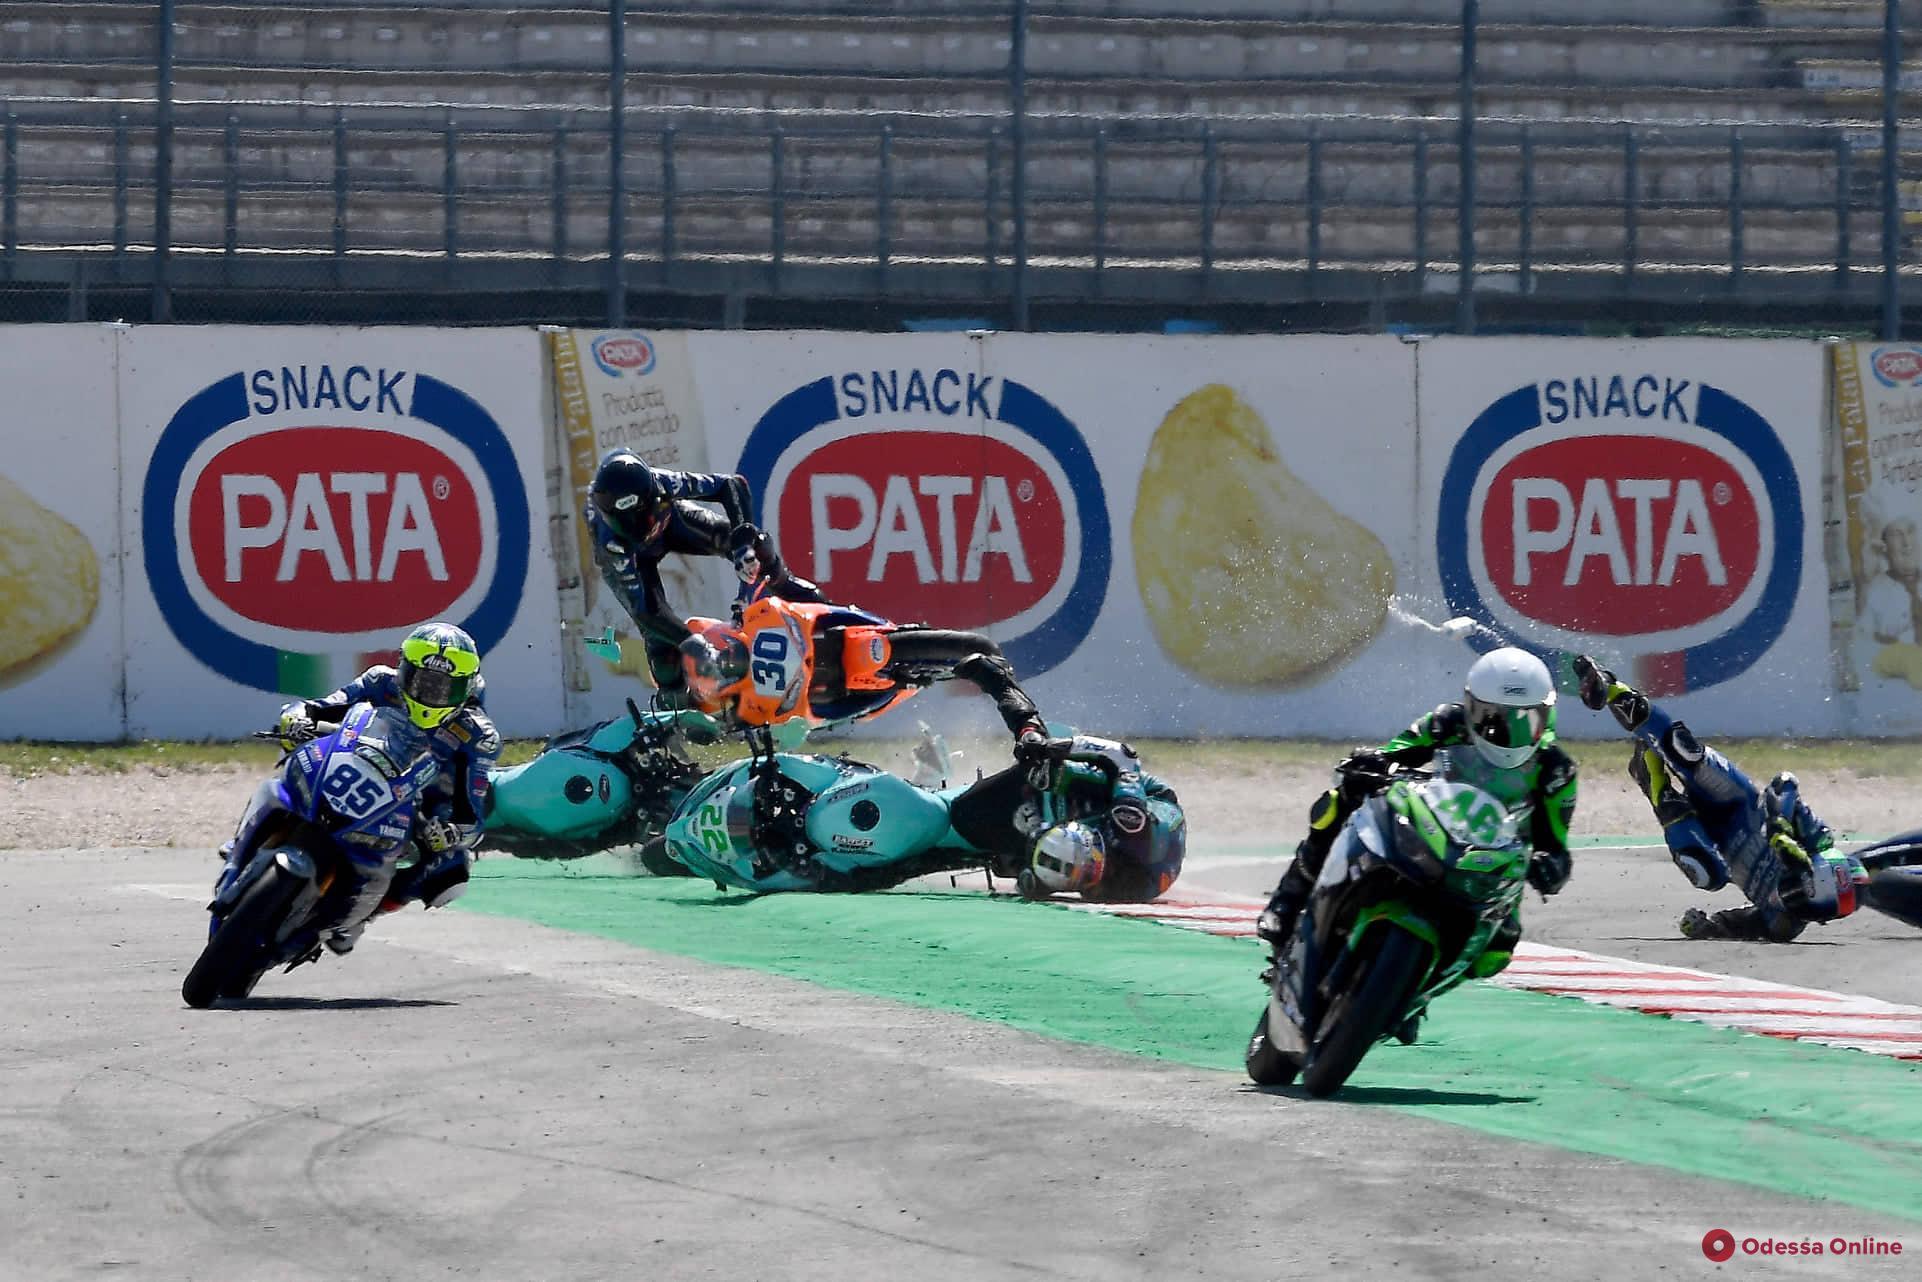 Мотоспорт: одессит попал в аварию на старте гонки в Италии